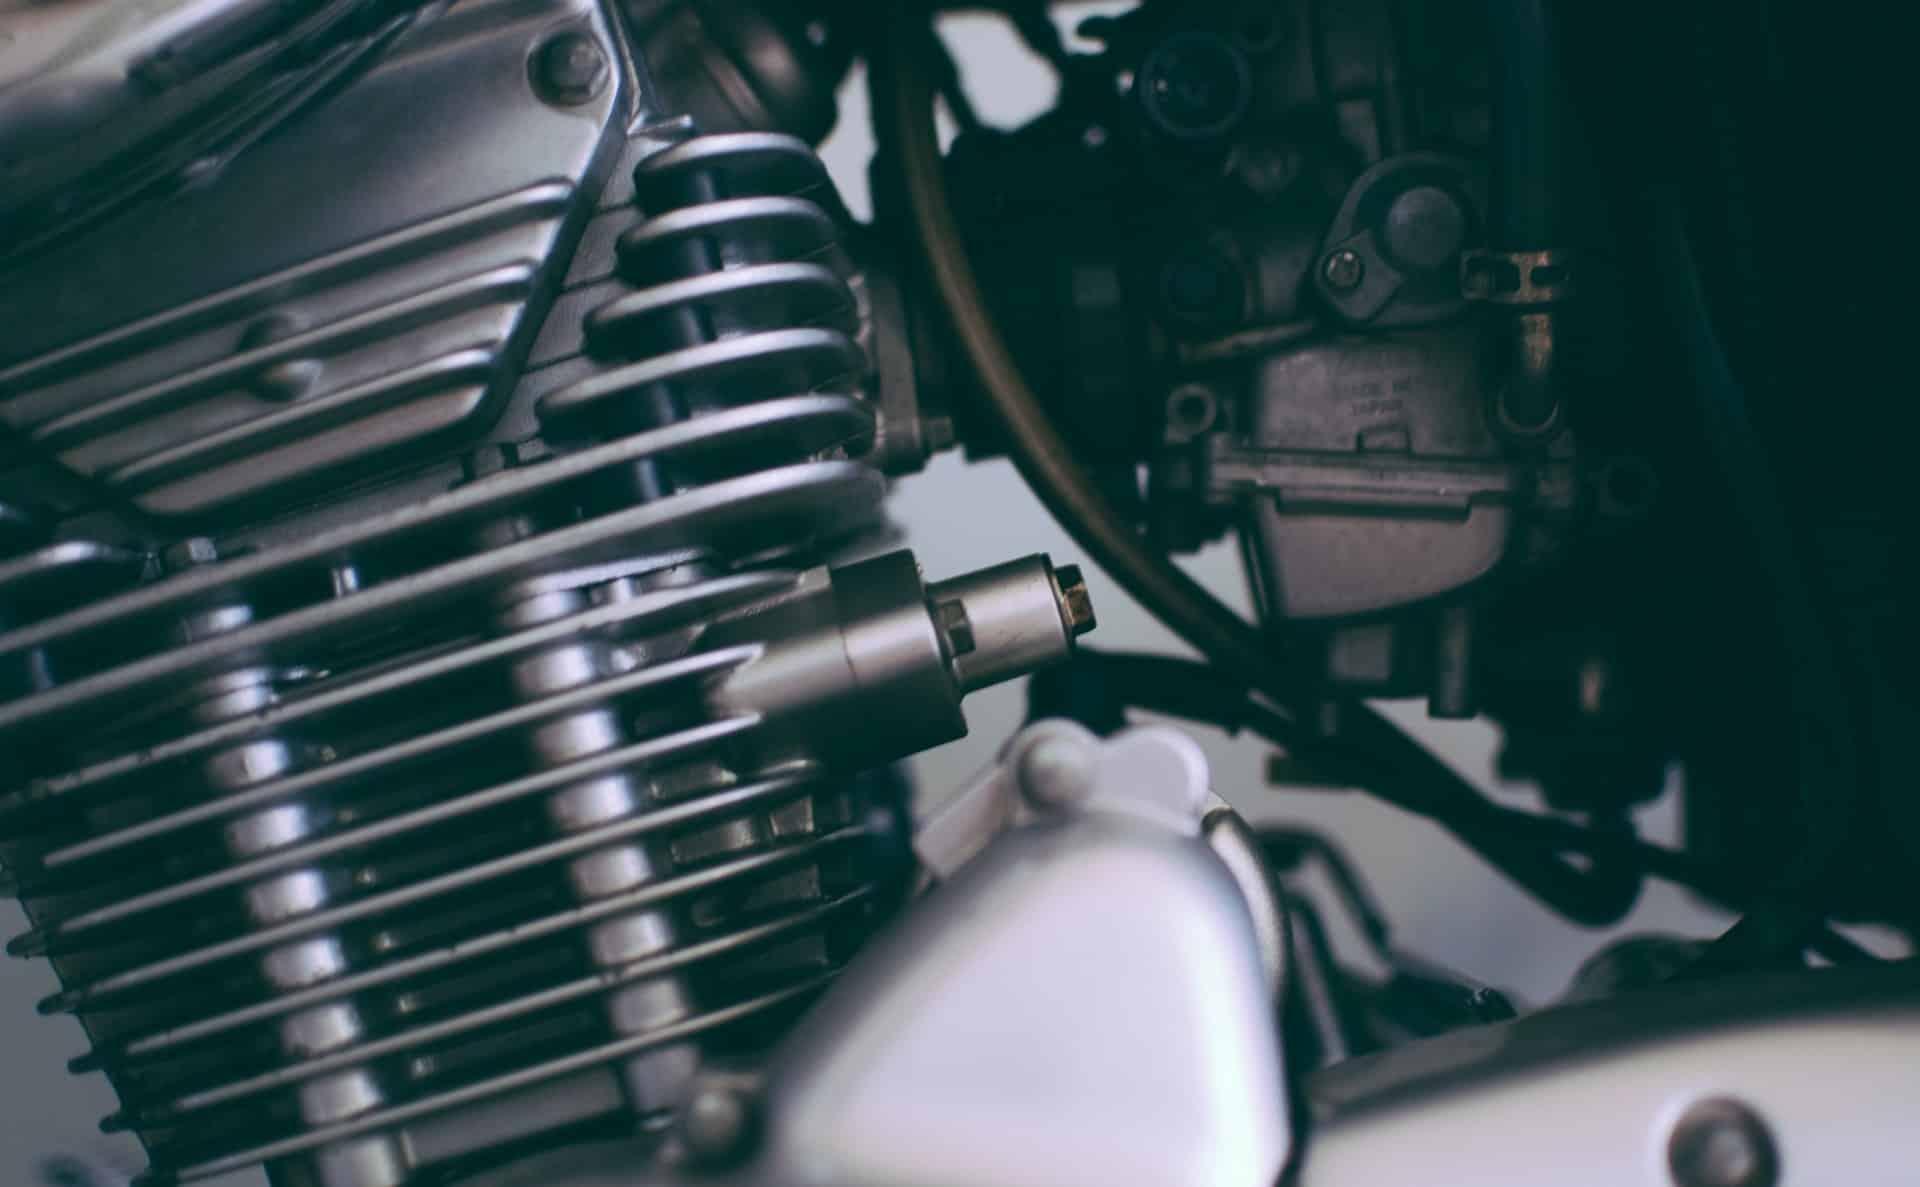 engine close up